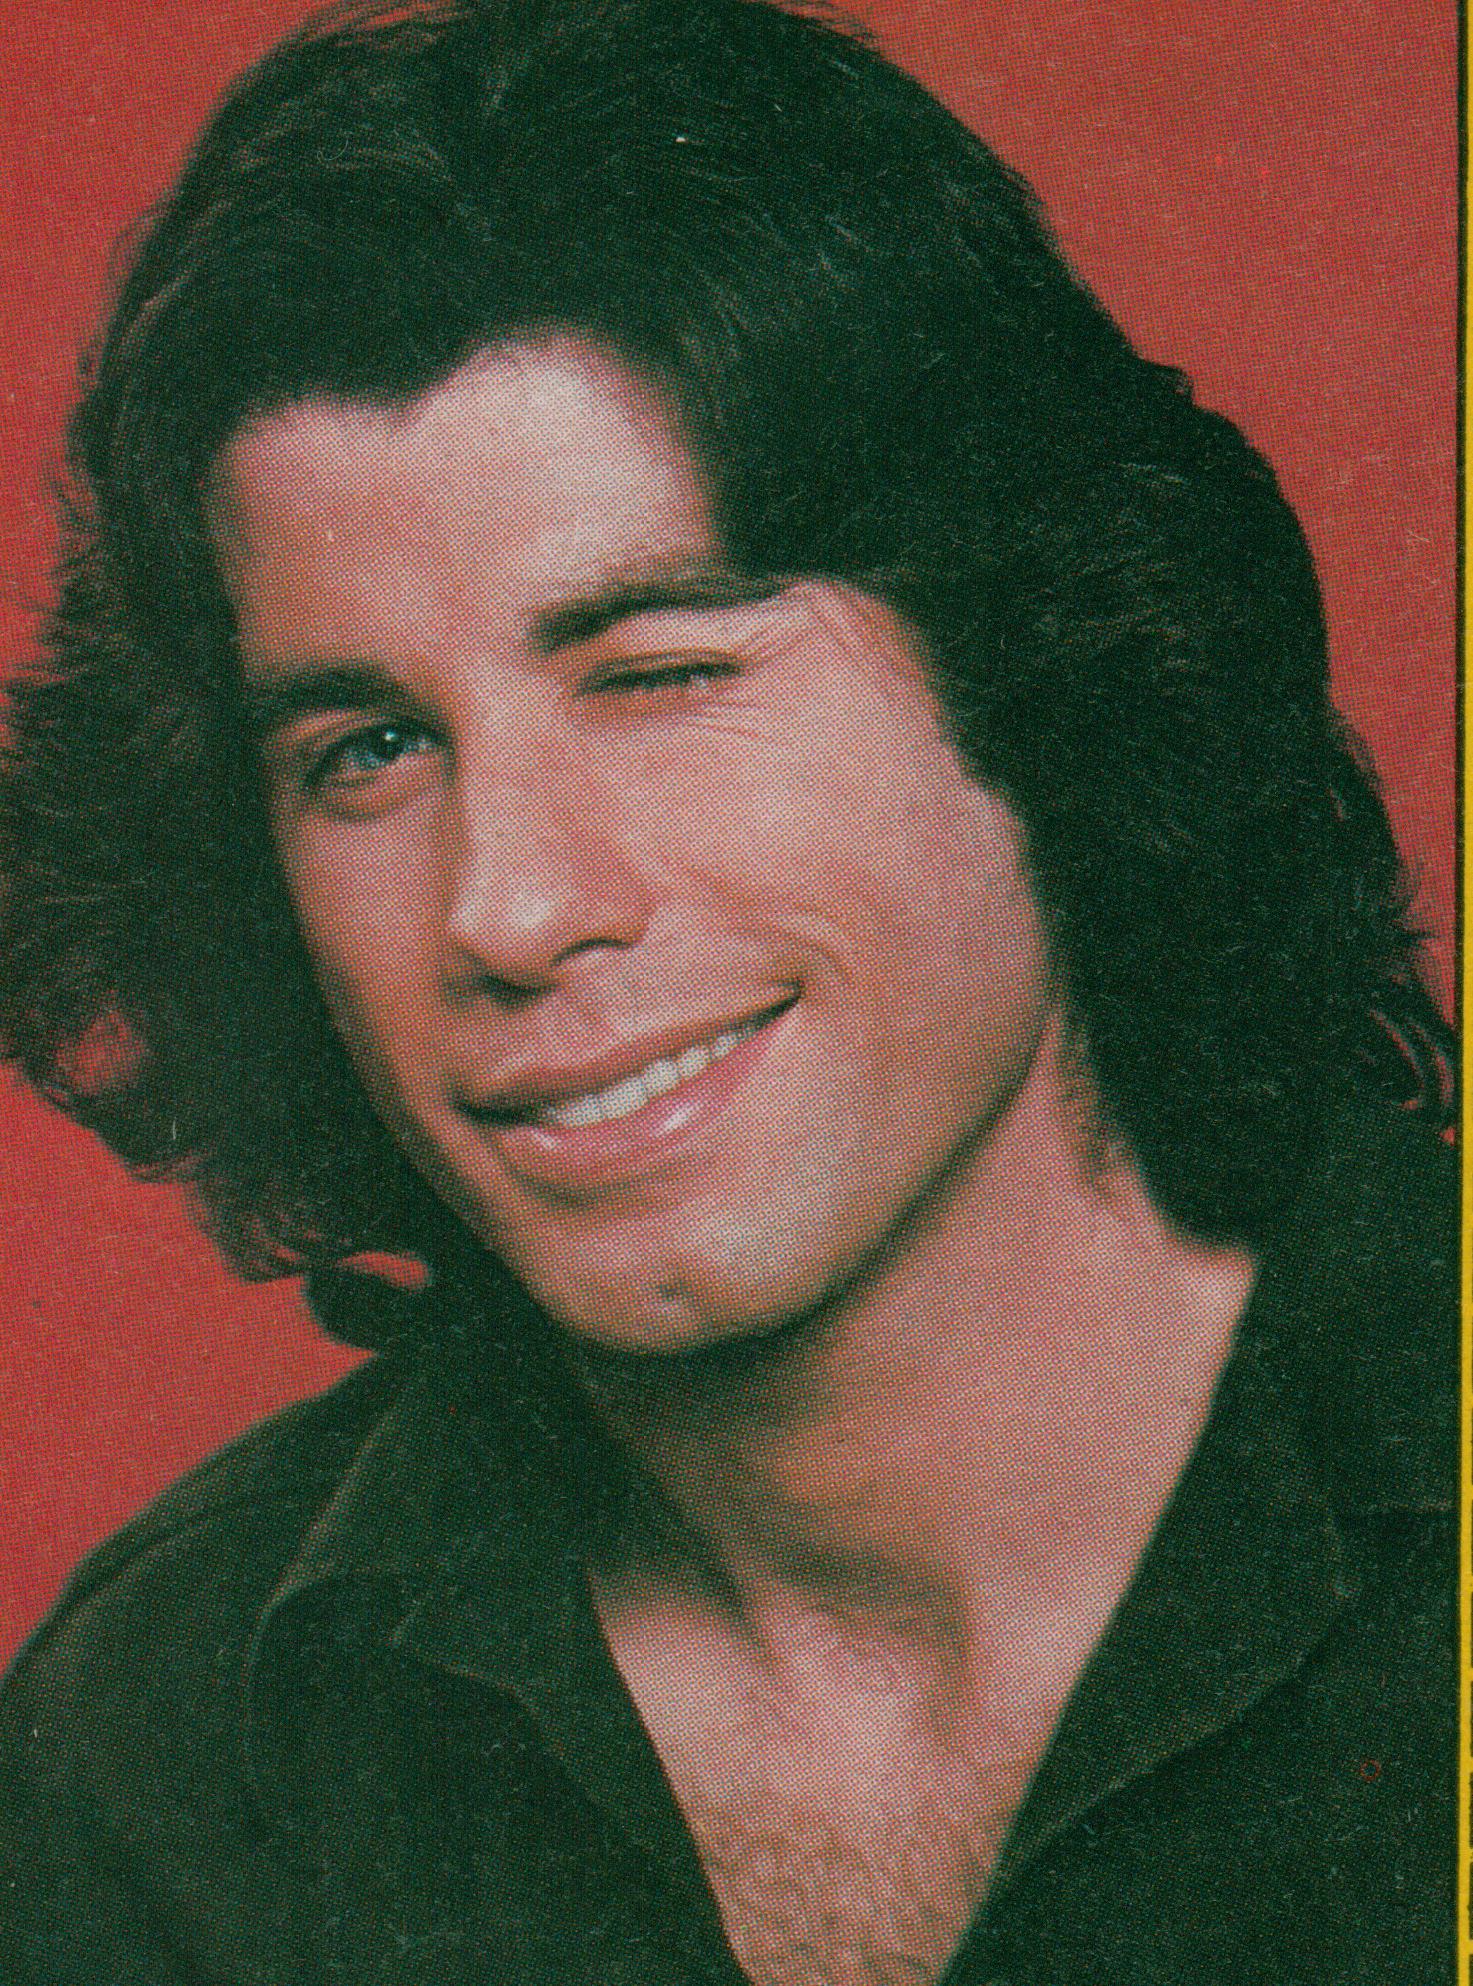 John Travolta Welcome Back Kotter - Sitcoms Online Photo ...